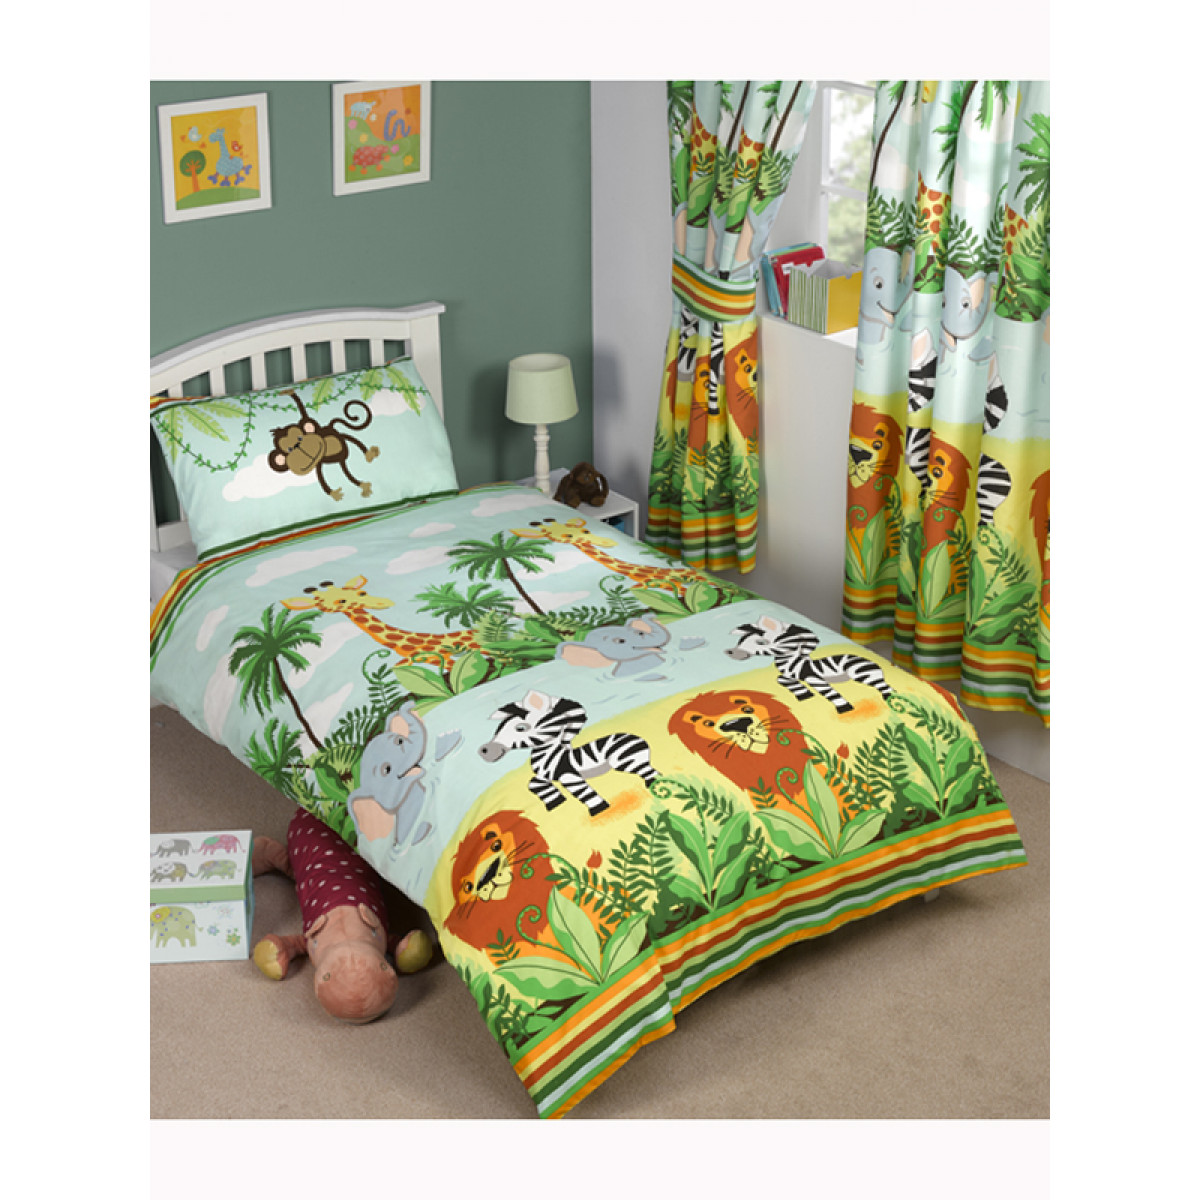 jungle tastic junior duvet cover and pillowcase set toddler. Black Bedroom Furniture Sets. Home Design Ideas